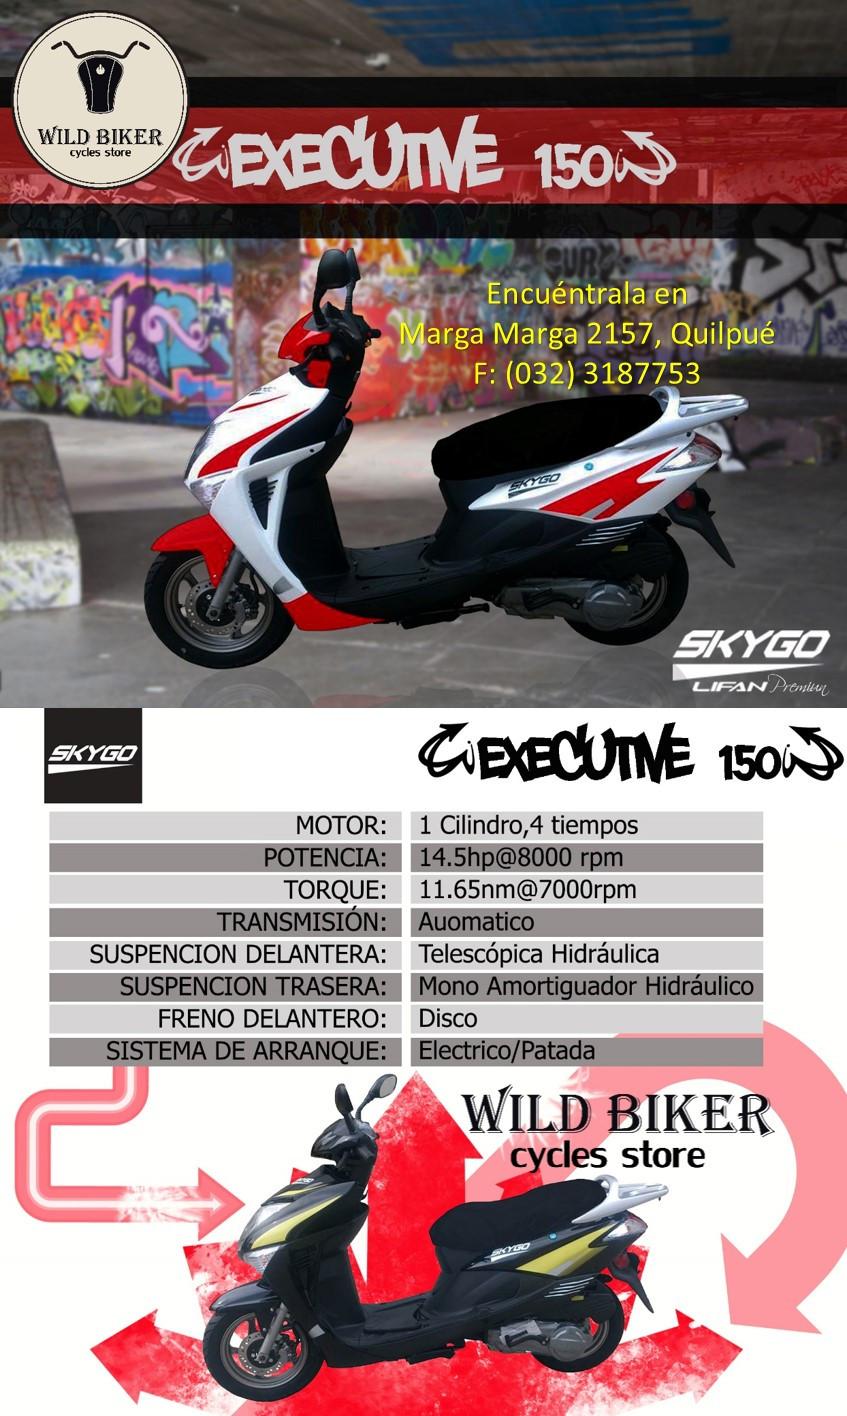 20150706 - Skygo Scooter Flyer.jpg